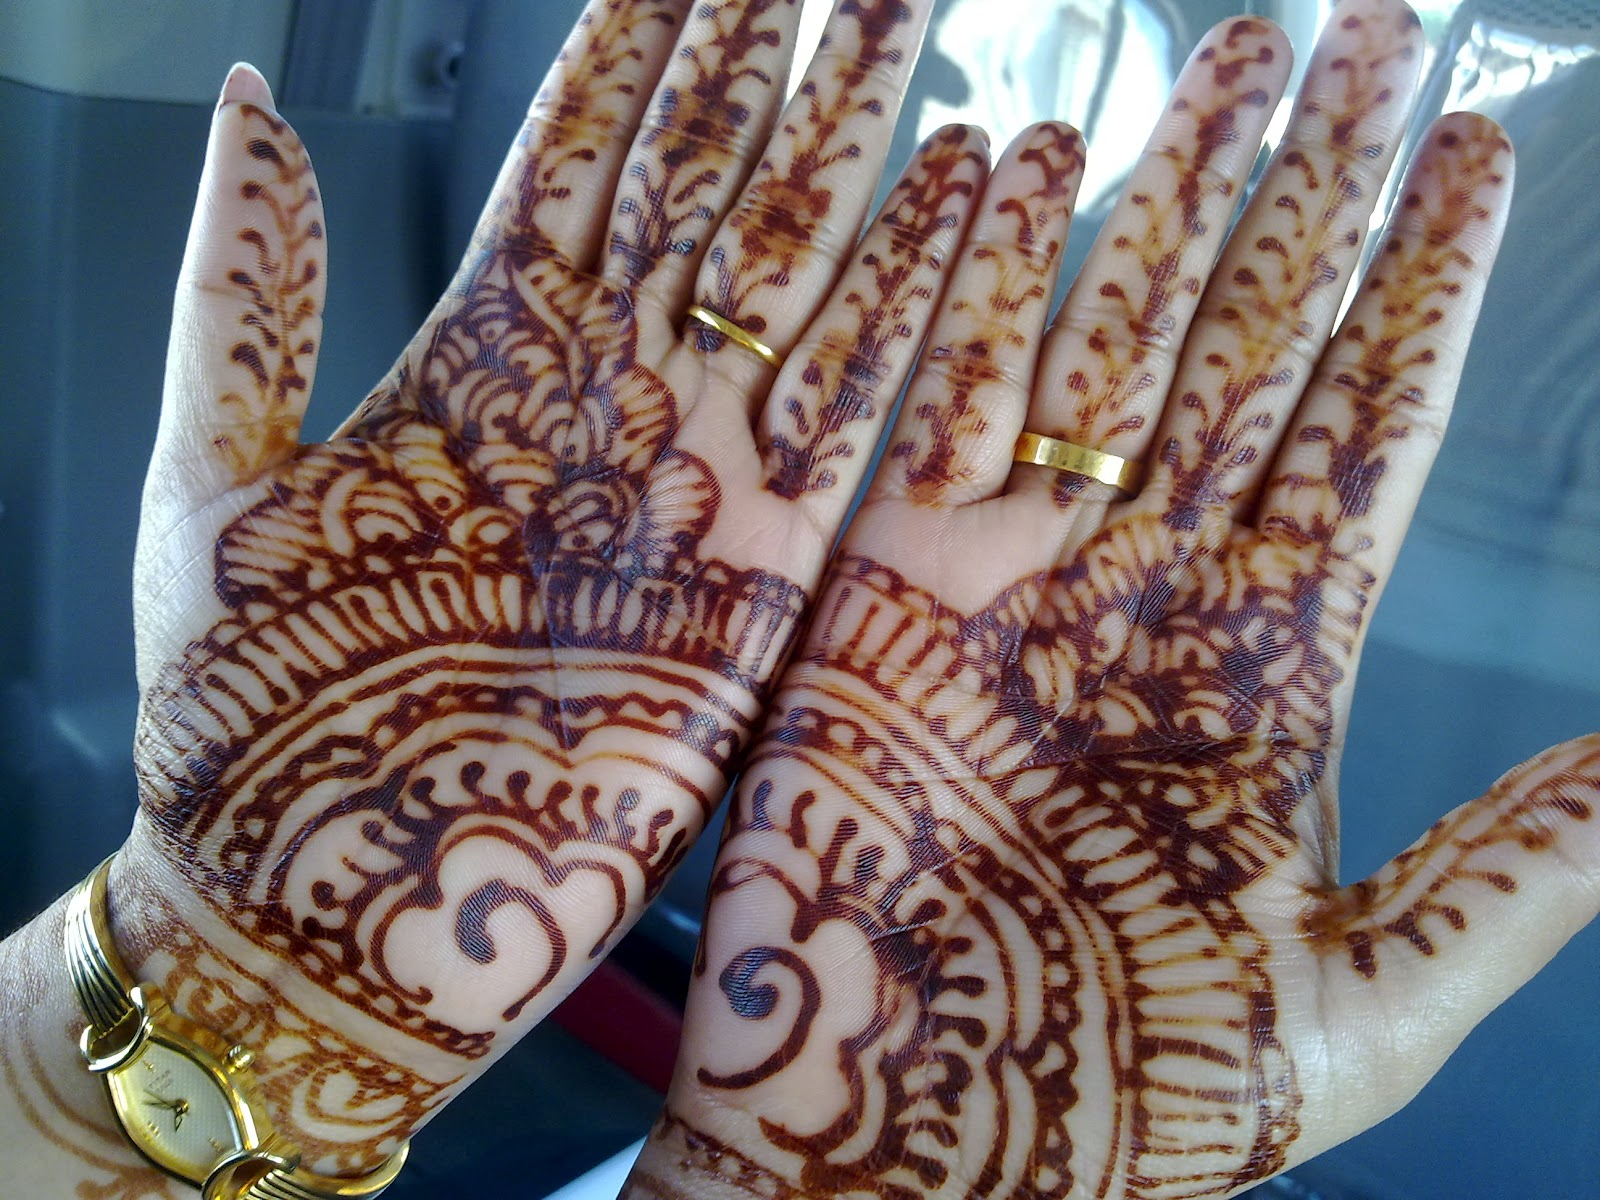 Indian Wedding Henna Tattoos: Mehndi Designs 2012: Henna Tattoos